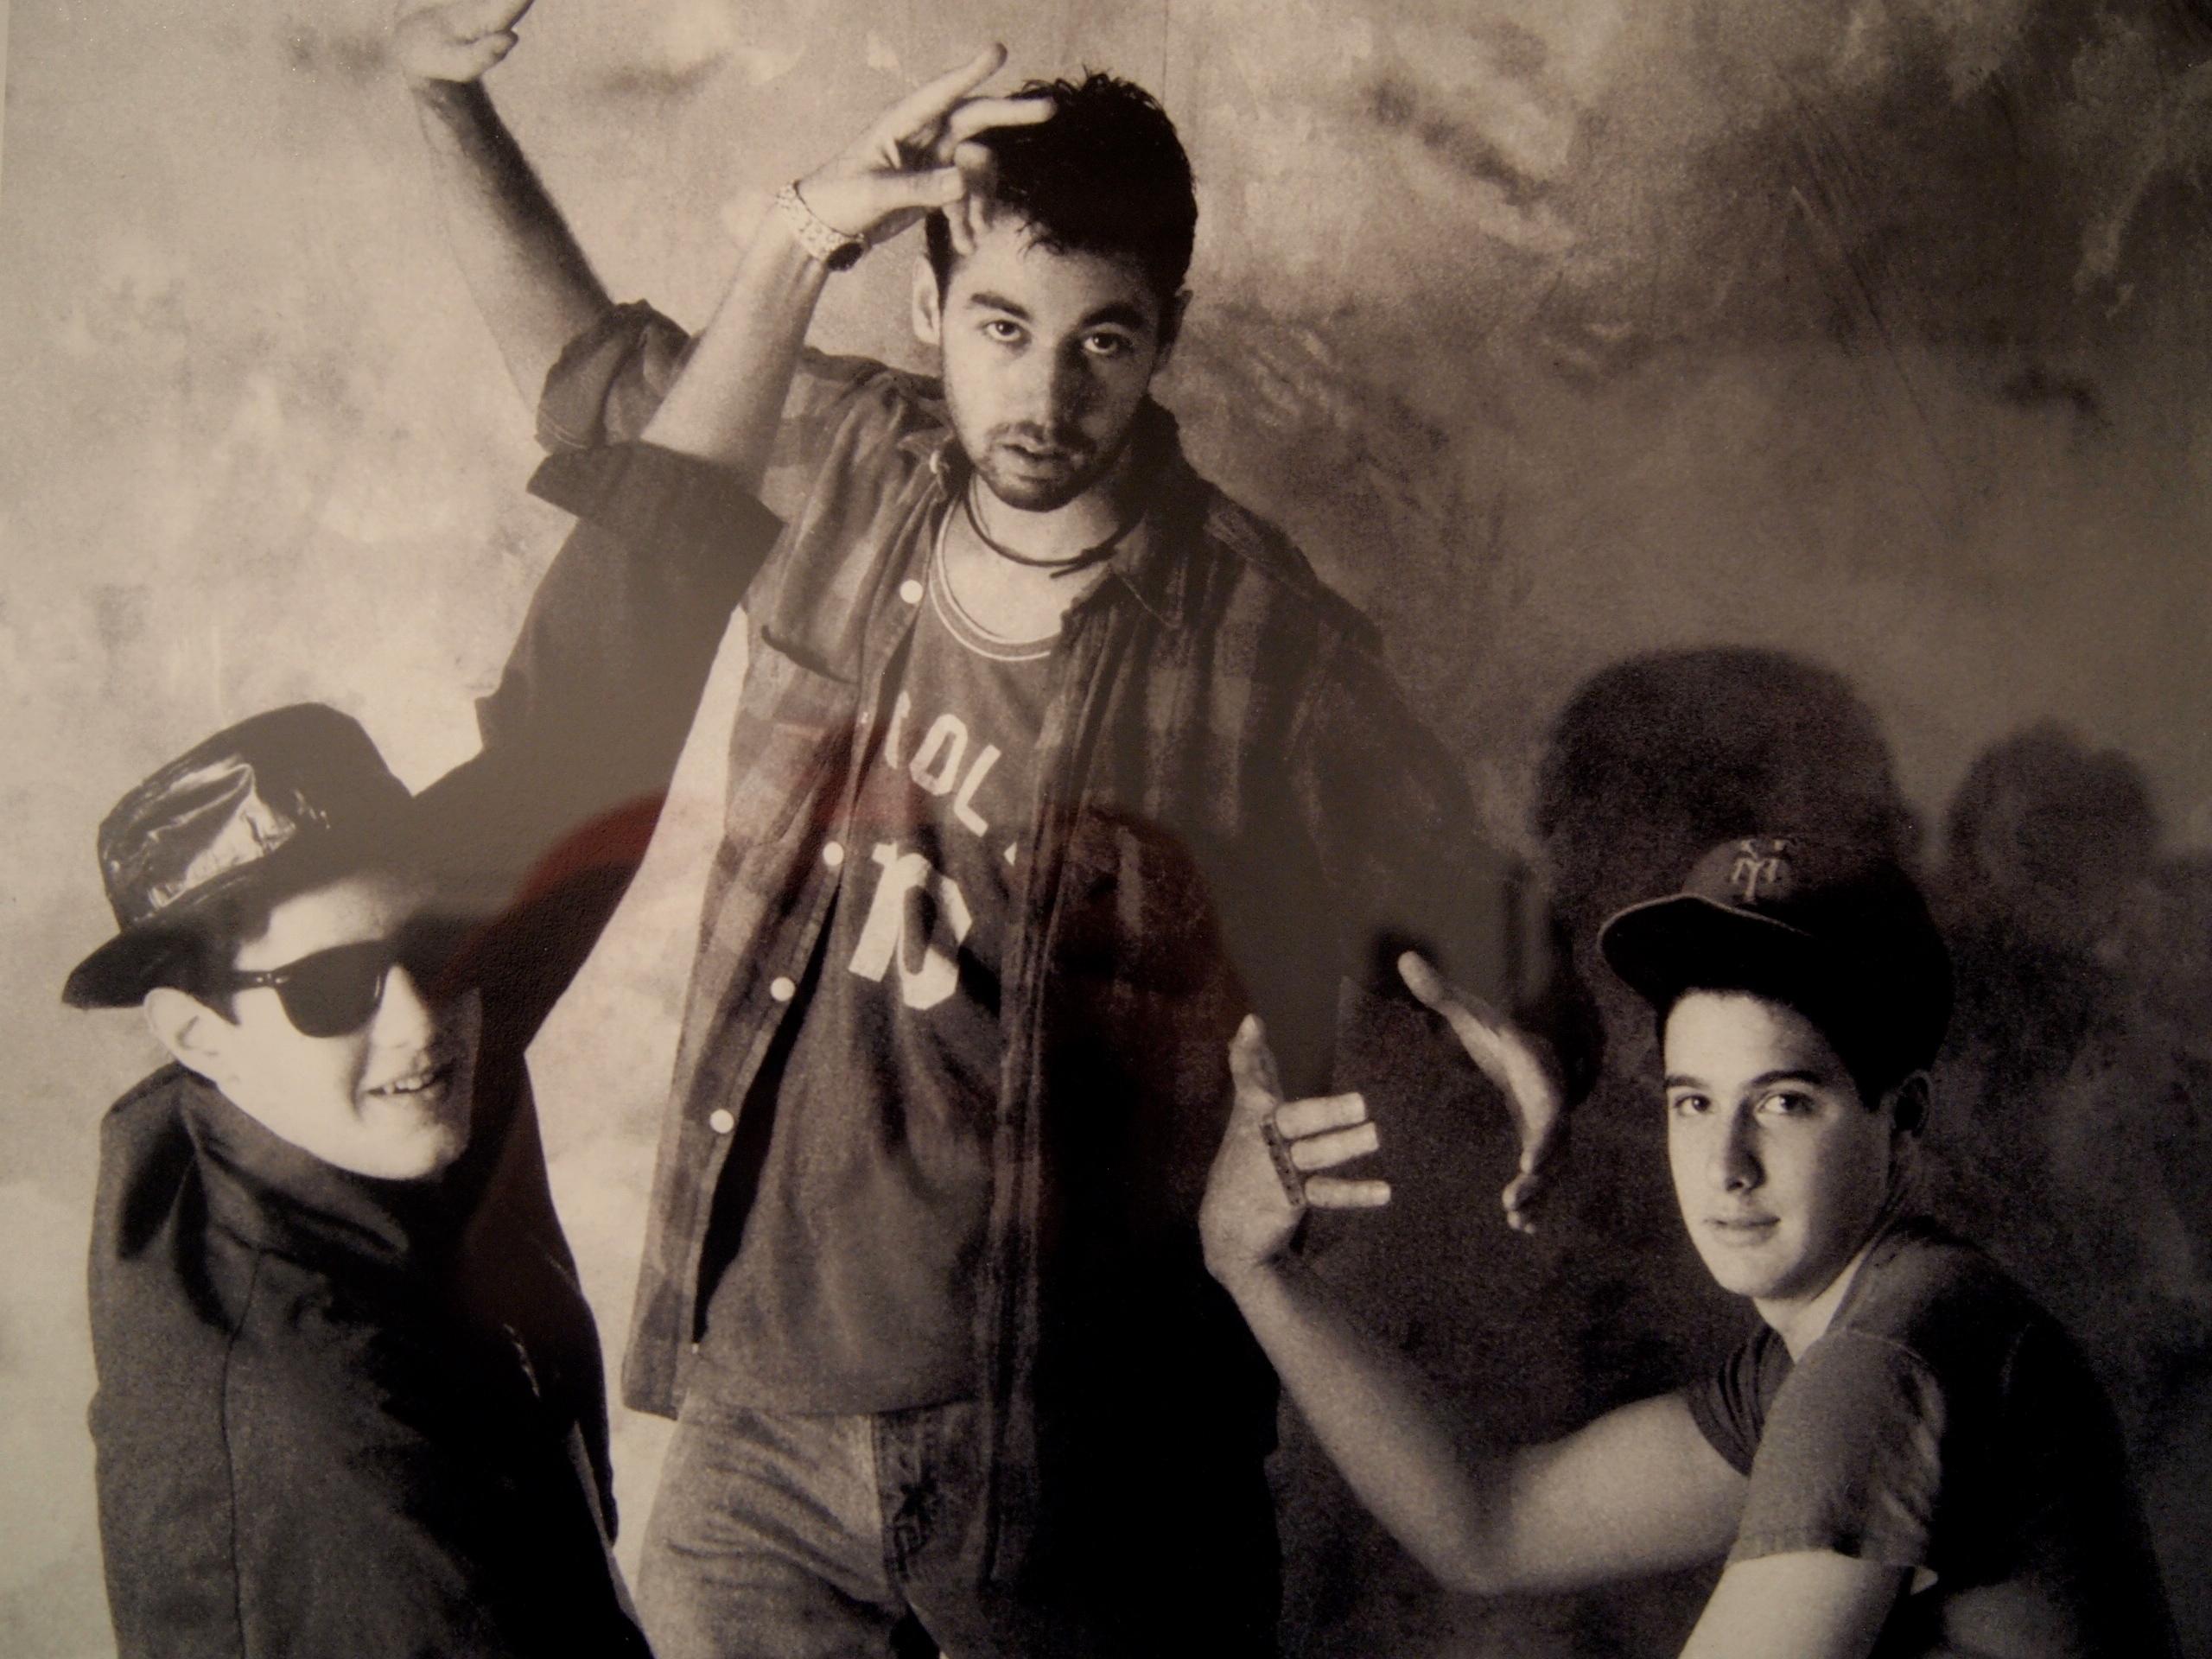 Beastie-Boys-wallpaper-wp4001307